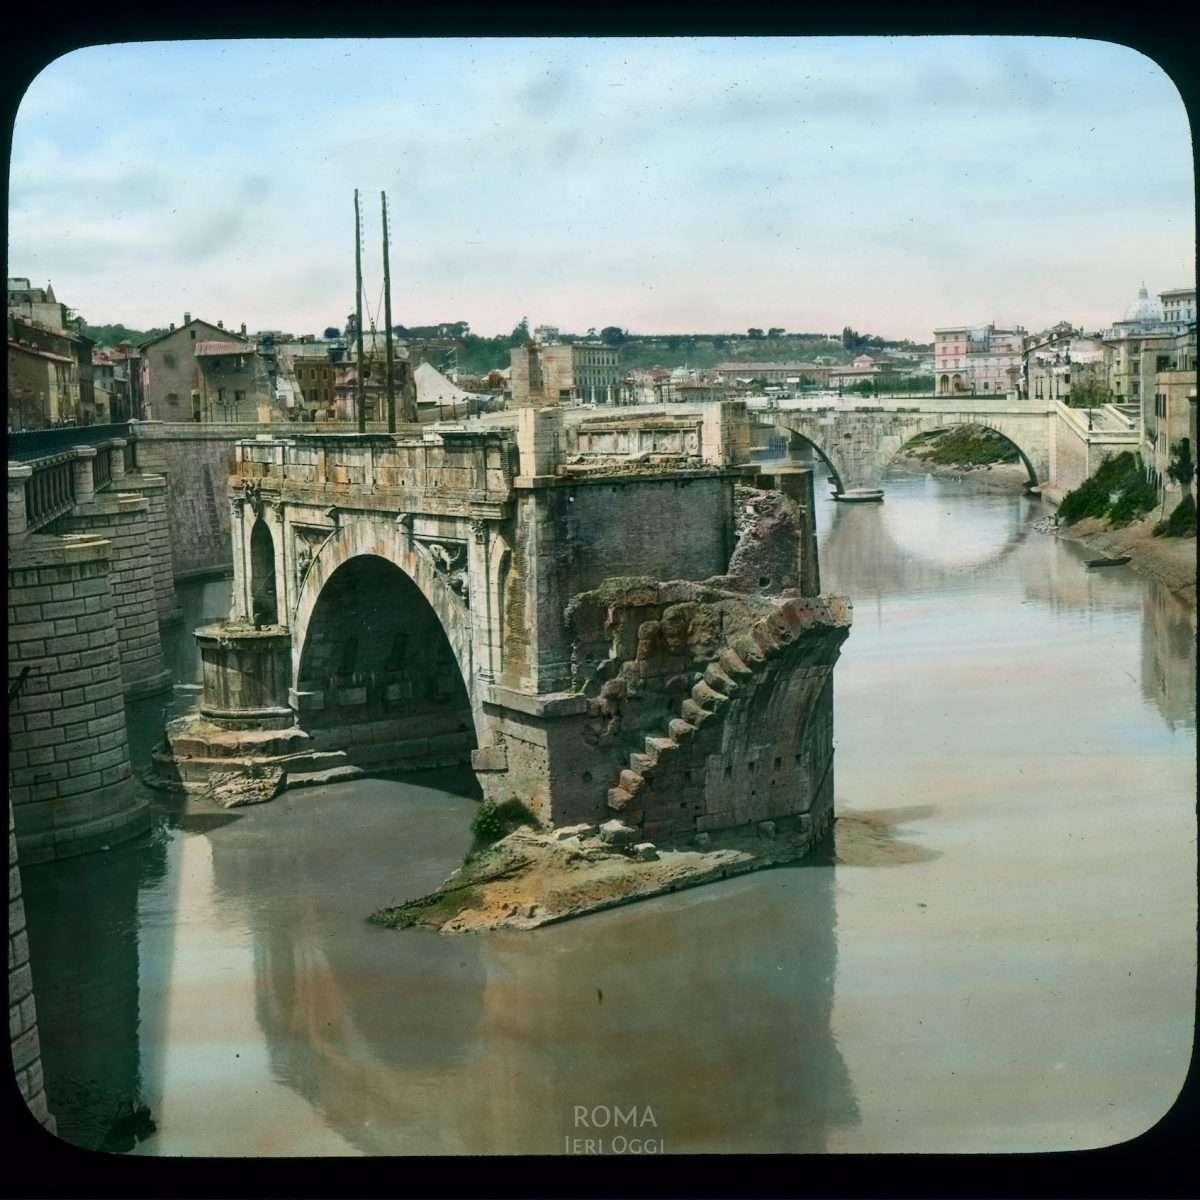 Rome. Ponte Rotto (Broken Bridge; Pons Aemelius), on the Tiber River View in tinted lantern slide, ca. 1919-1938. The bridge dates from ca. 142 B.C.E.